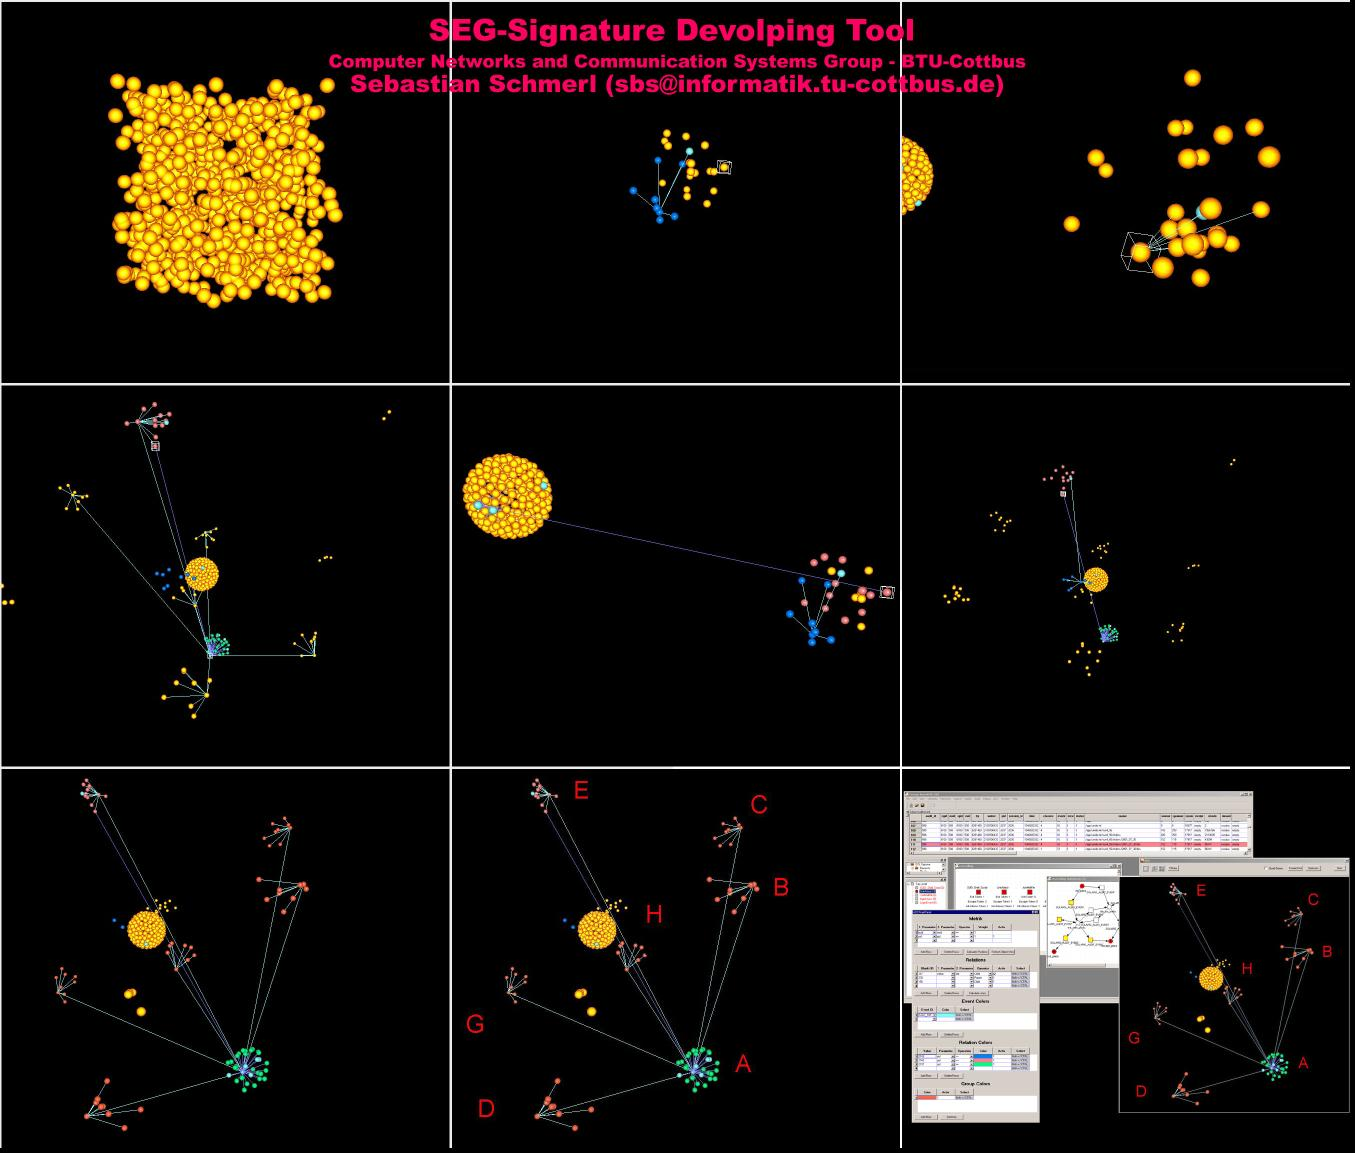 Explorative Visualization of Log Data to support Signature Development